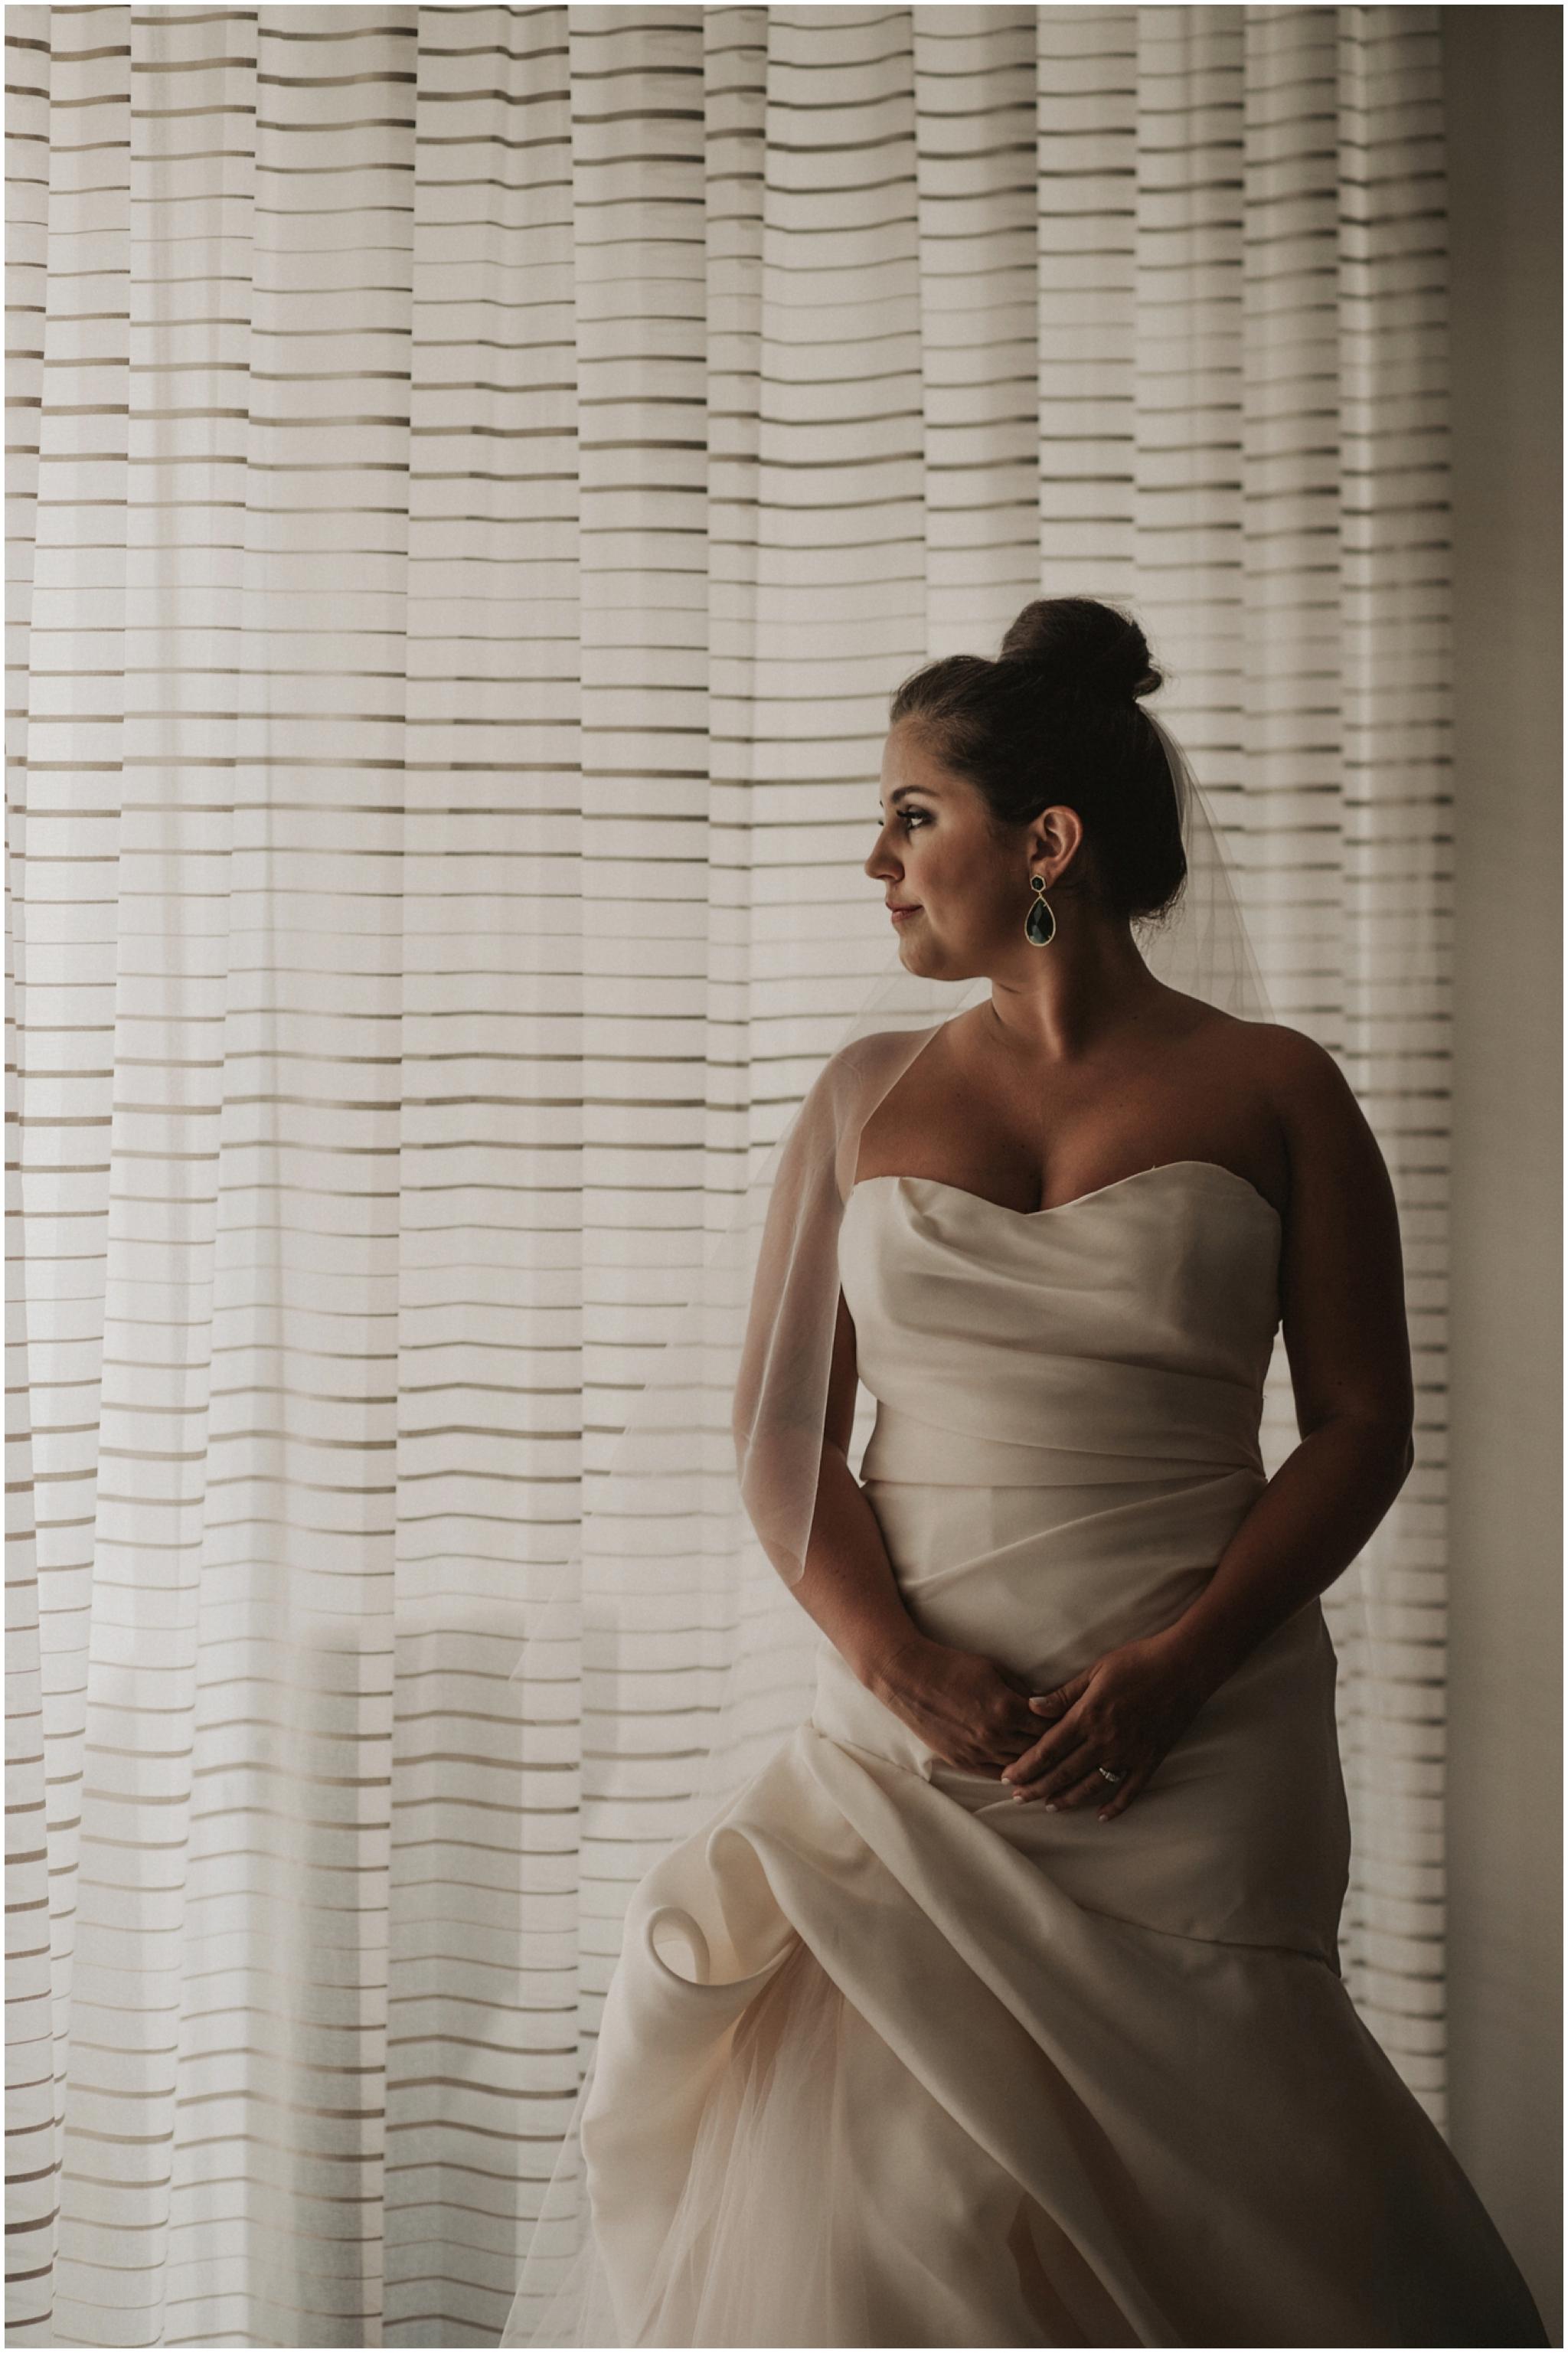 Gansevoort Turks & Caicos Beautiful Bride